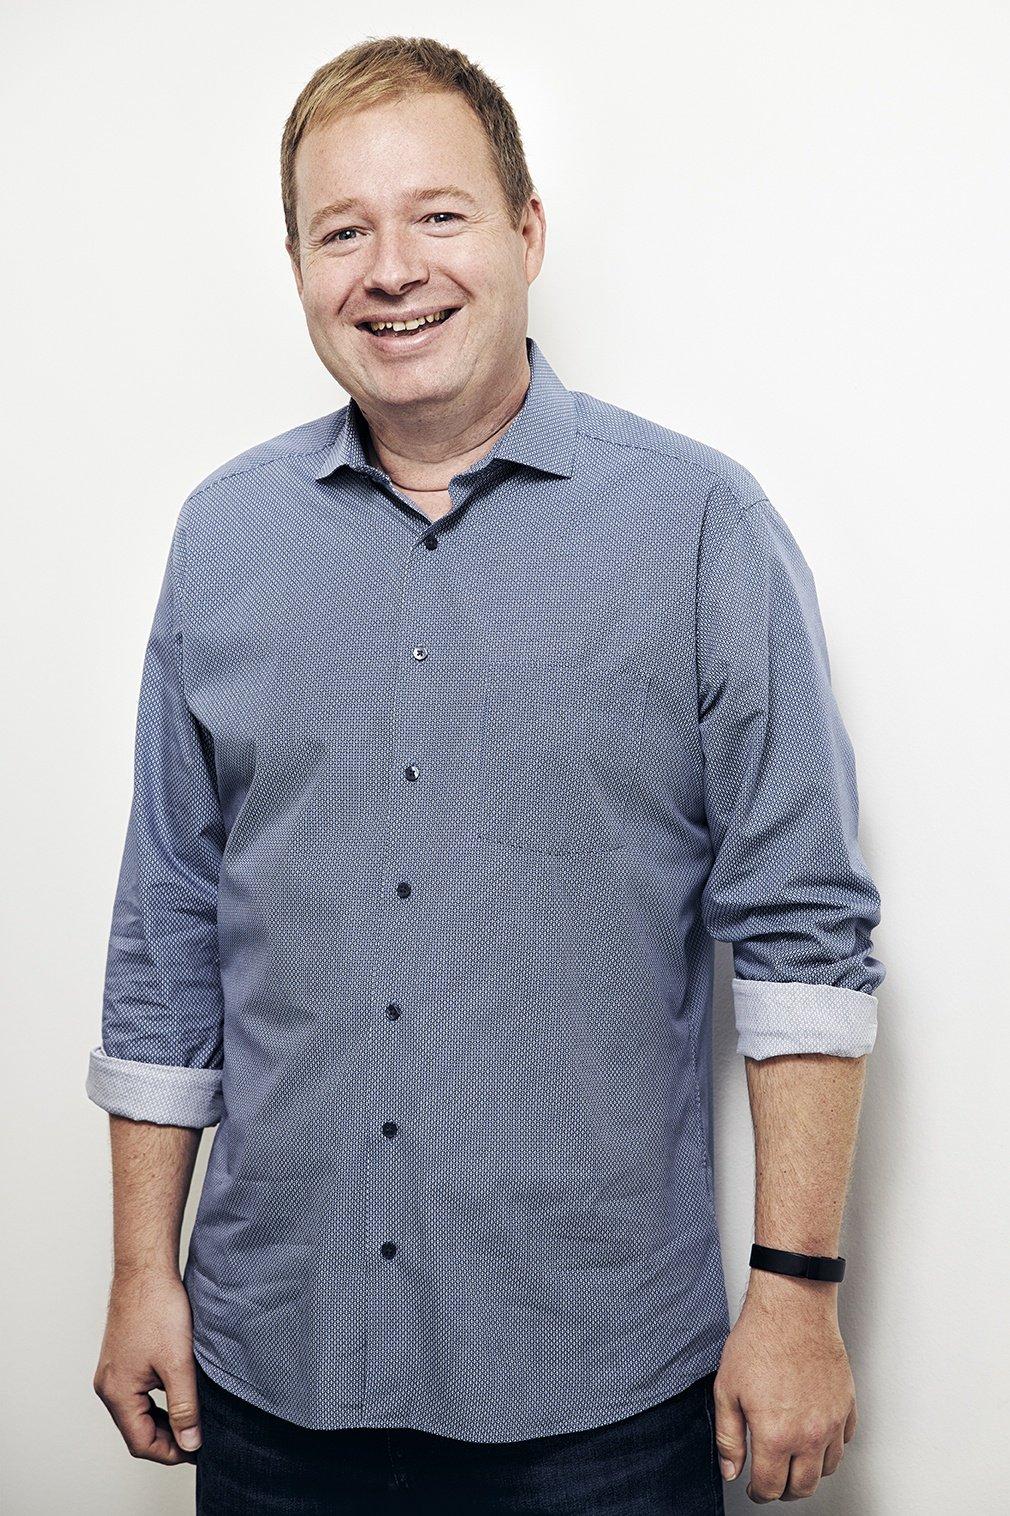 David Krogstrup